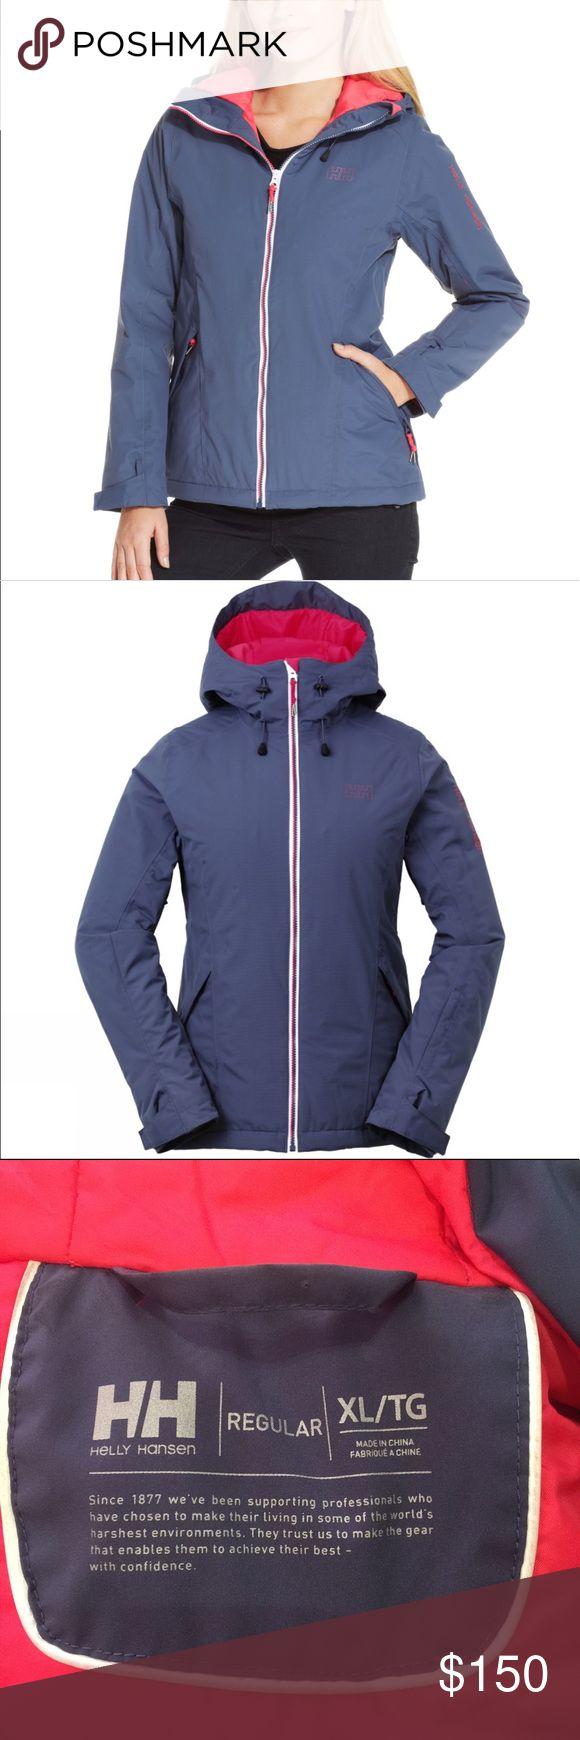 Helly Hansen winter ski coat. Helly Hansen winter ski coat.  Periwinkle/gray & pink Helly Hansen Jackets & Coats